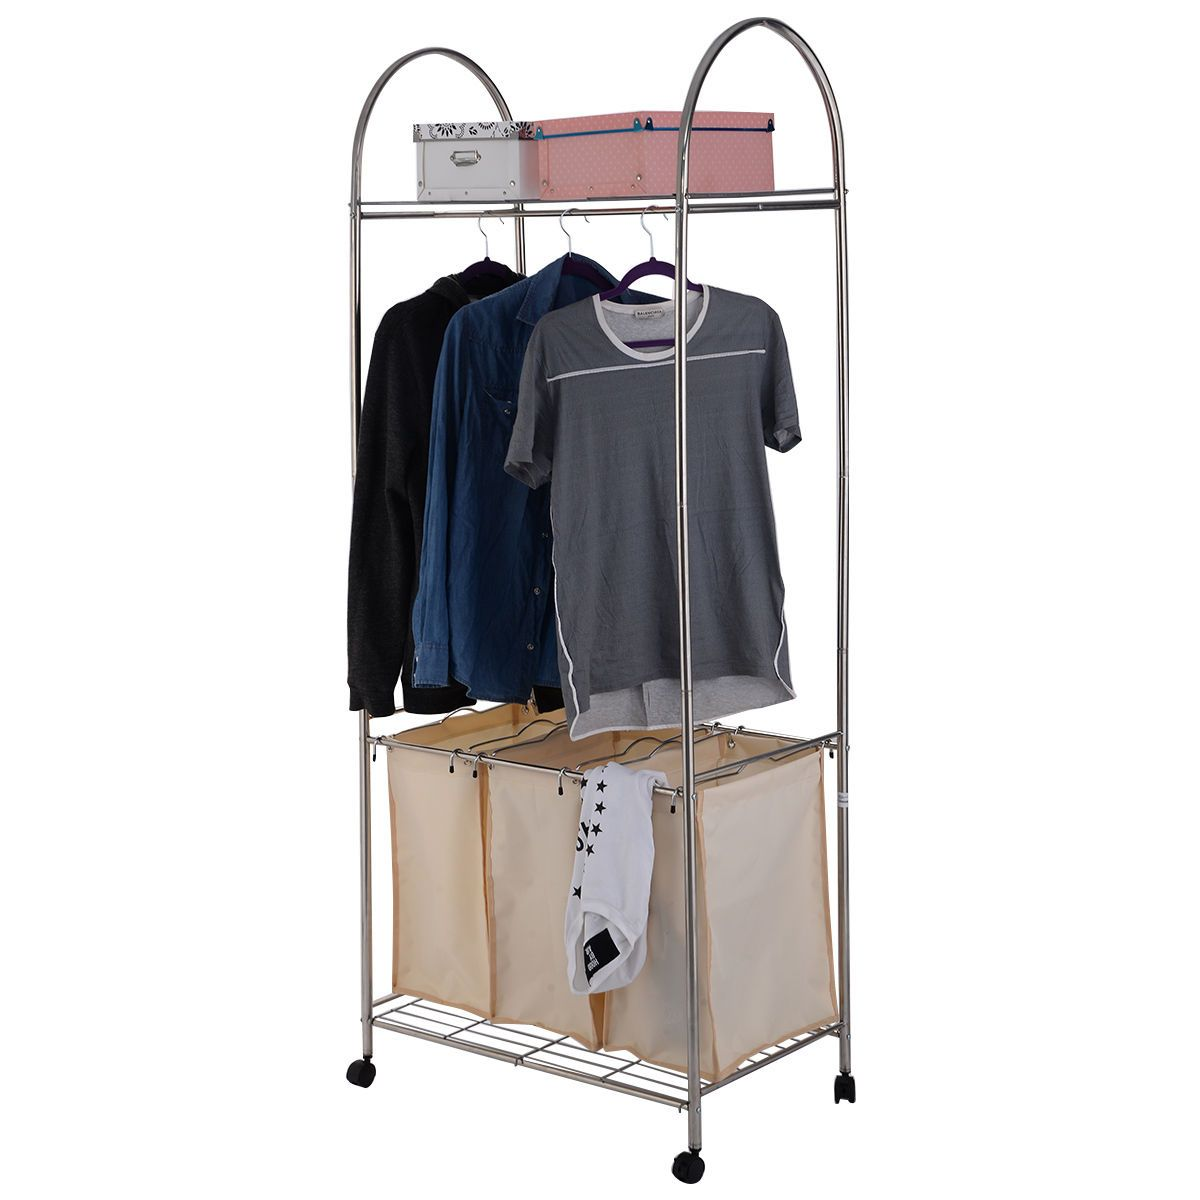 3 bag rolling laundry cart sorter hamper washing clothes bin